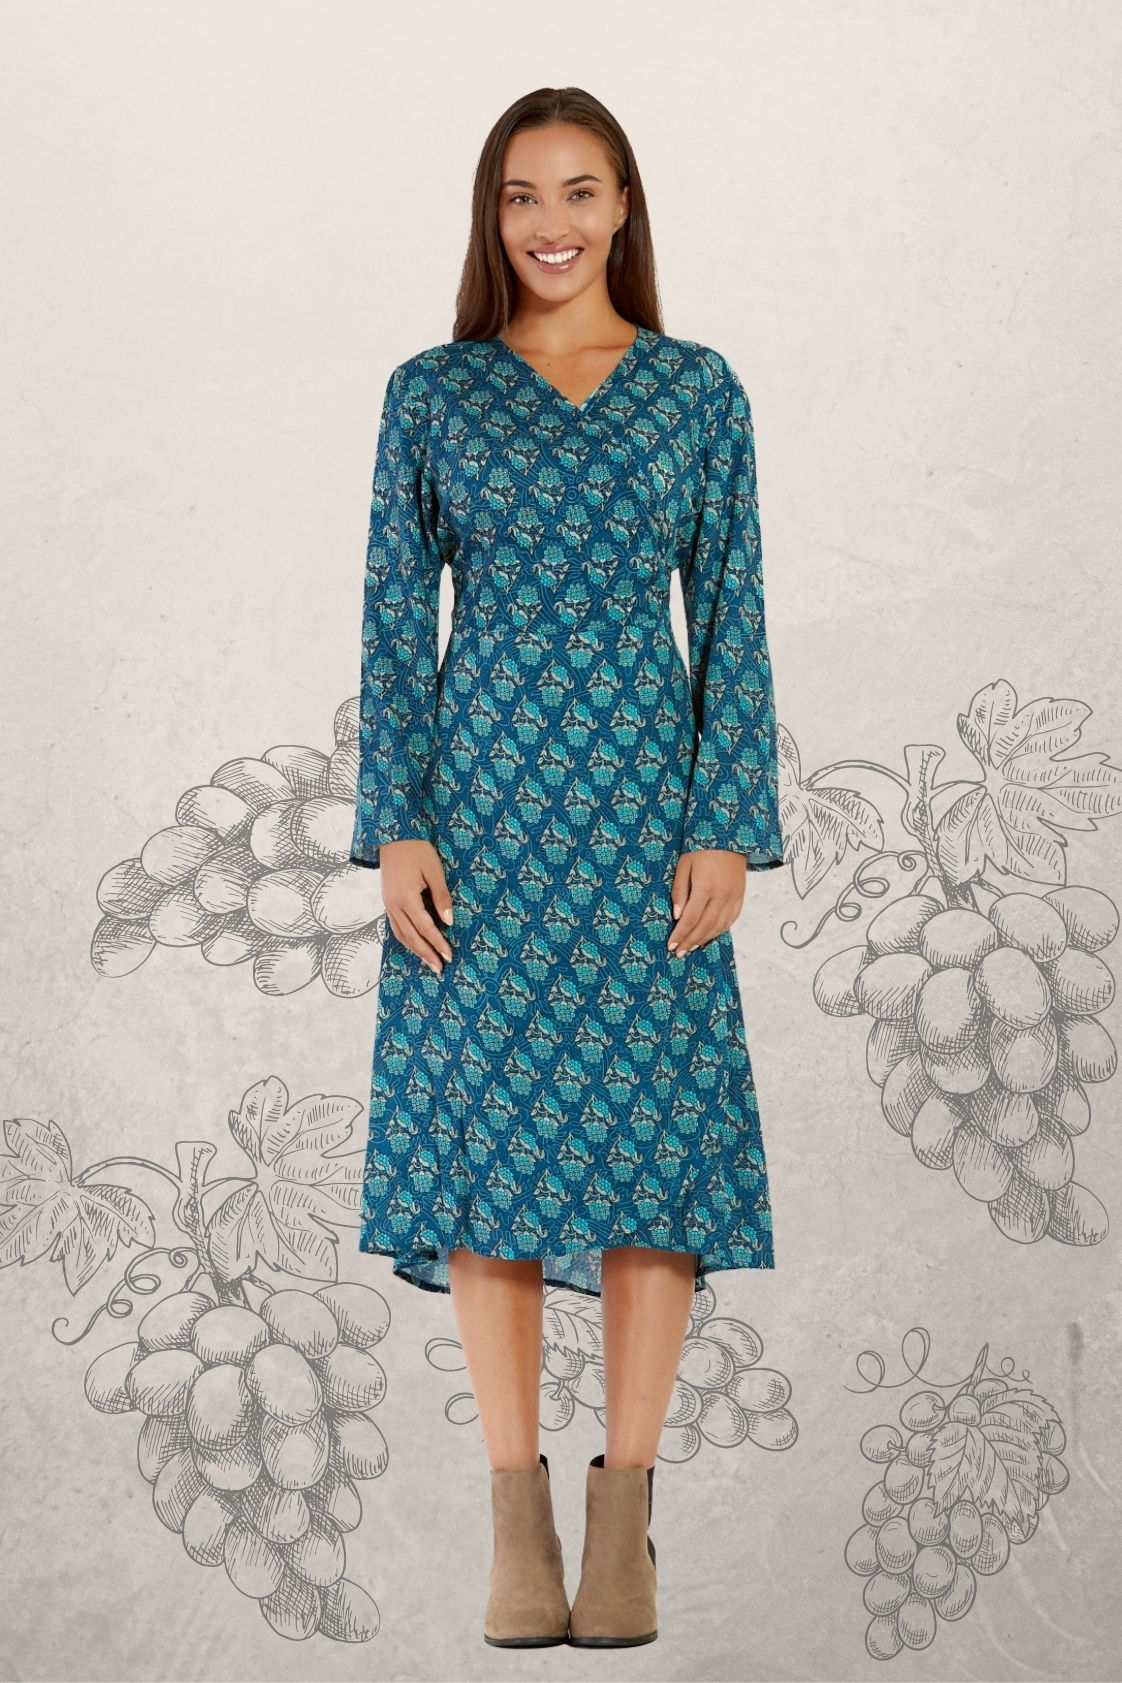 Micki long Sleeve Wrap Dress - Grapes Print